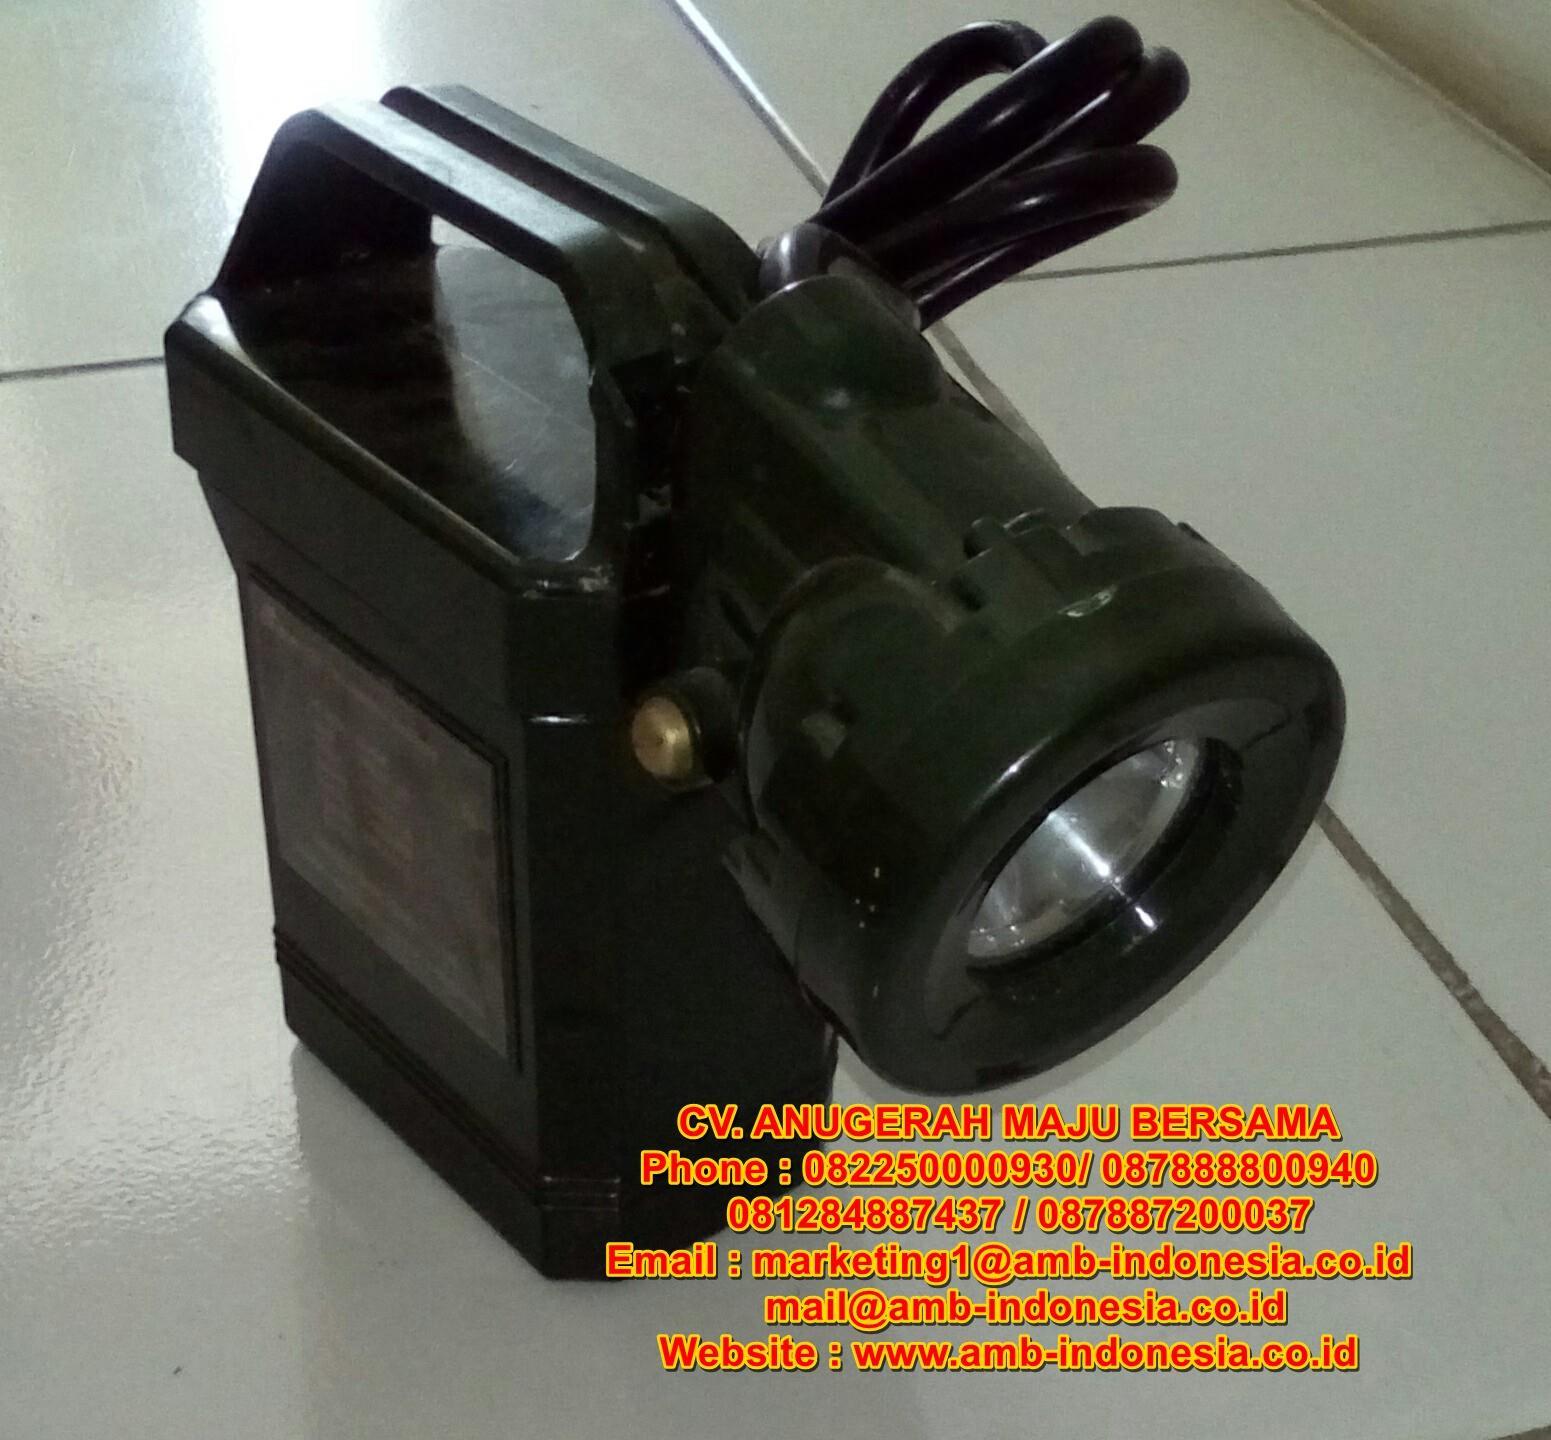 Jual Lampu Senter Explosion Proof LED Rechargeable Qinsun